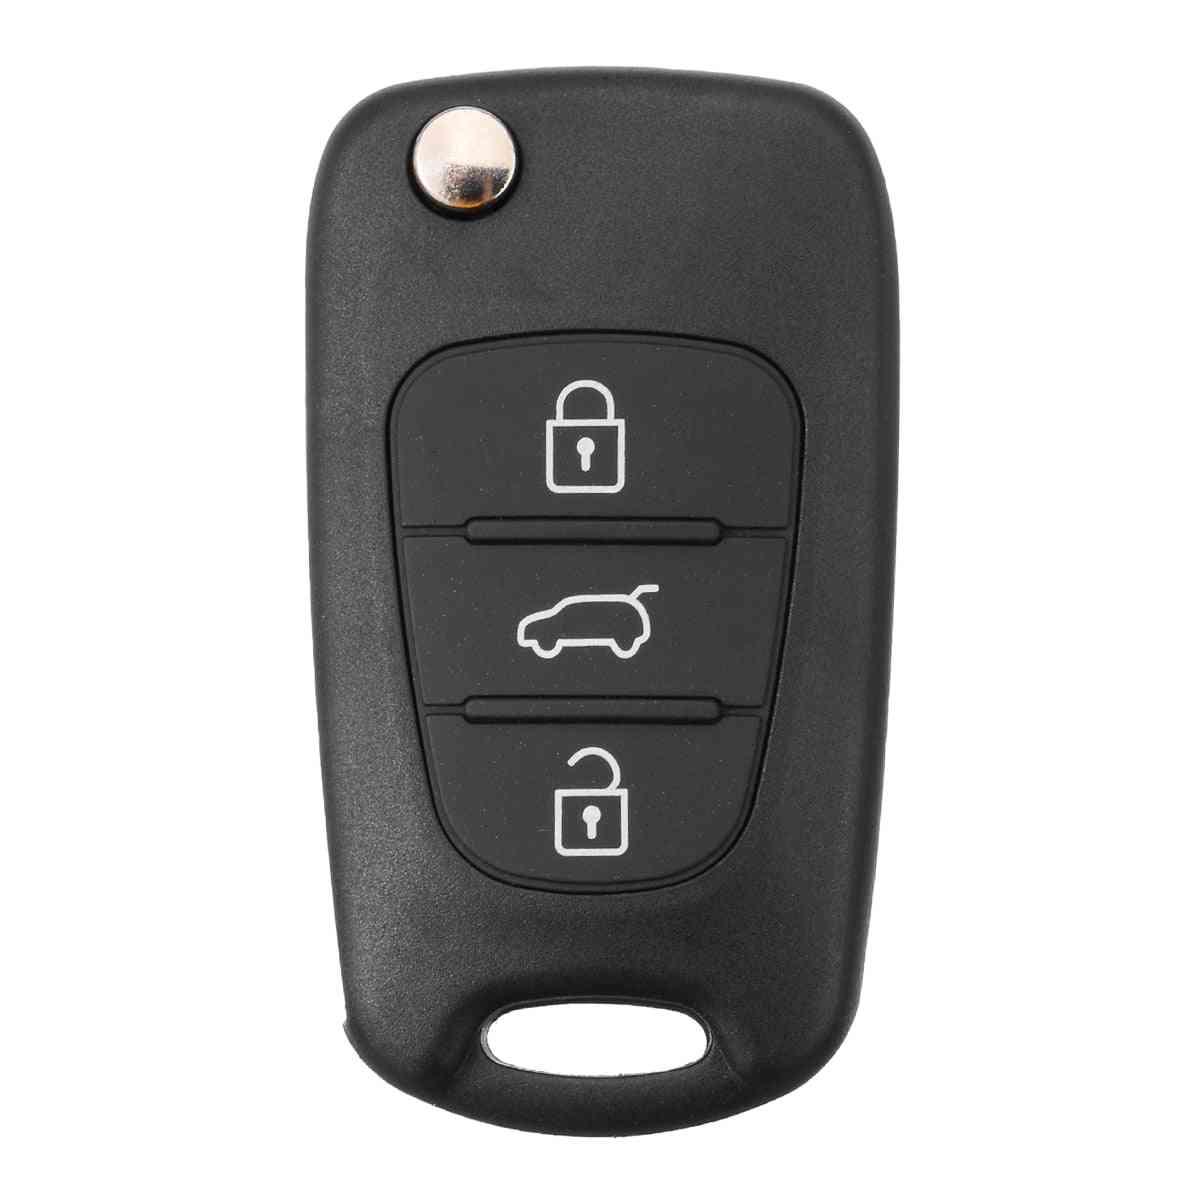 Button Car Key Cover Case, Remote Fob Shell Accessories